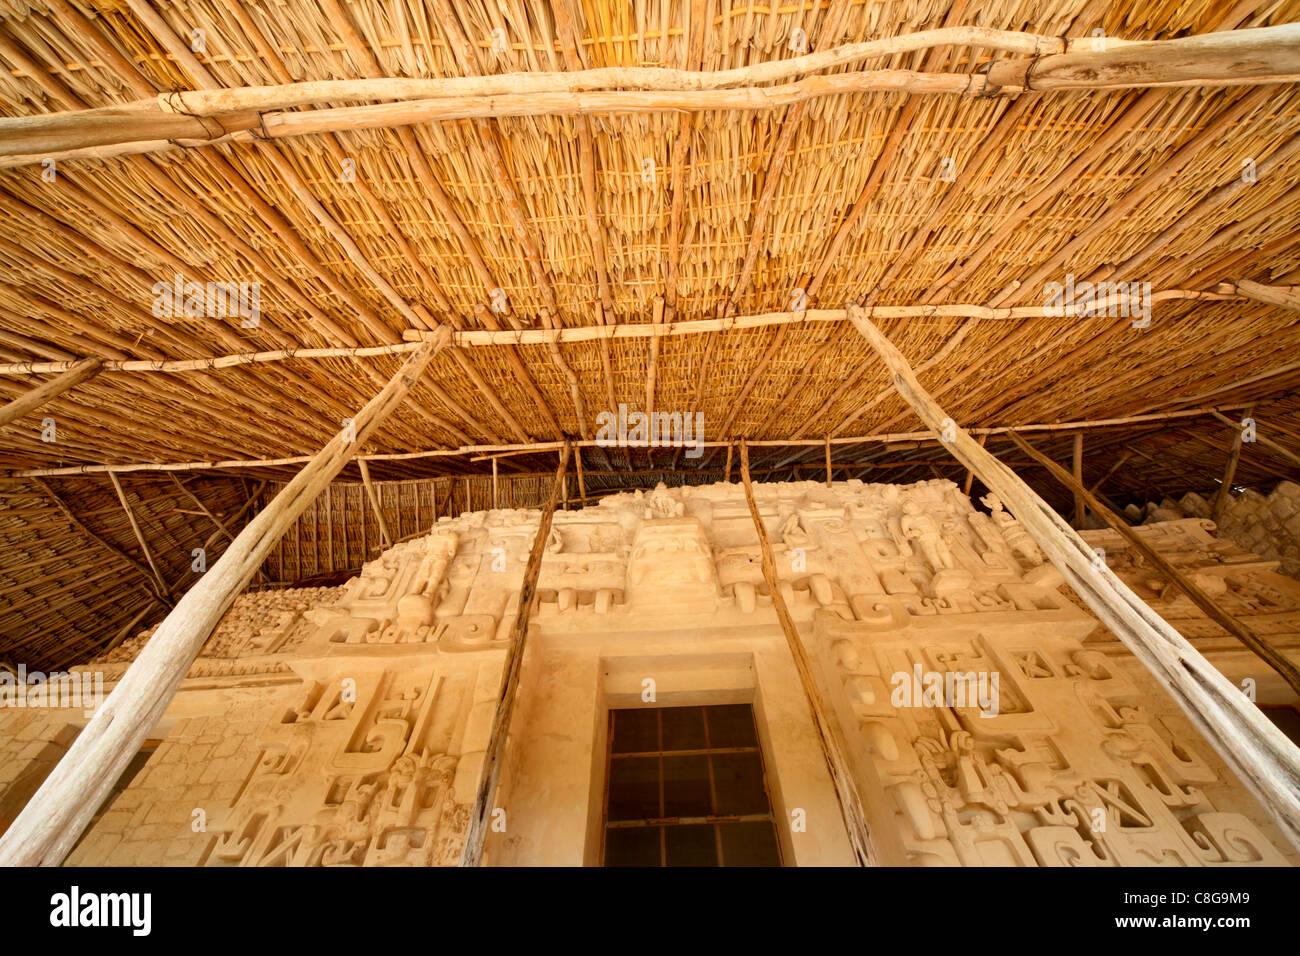 Preservación y recreación de la tumba de Ukit Kan Le'K Tok, Ek Balam, Yucatán, México Foto de stock